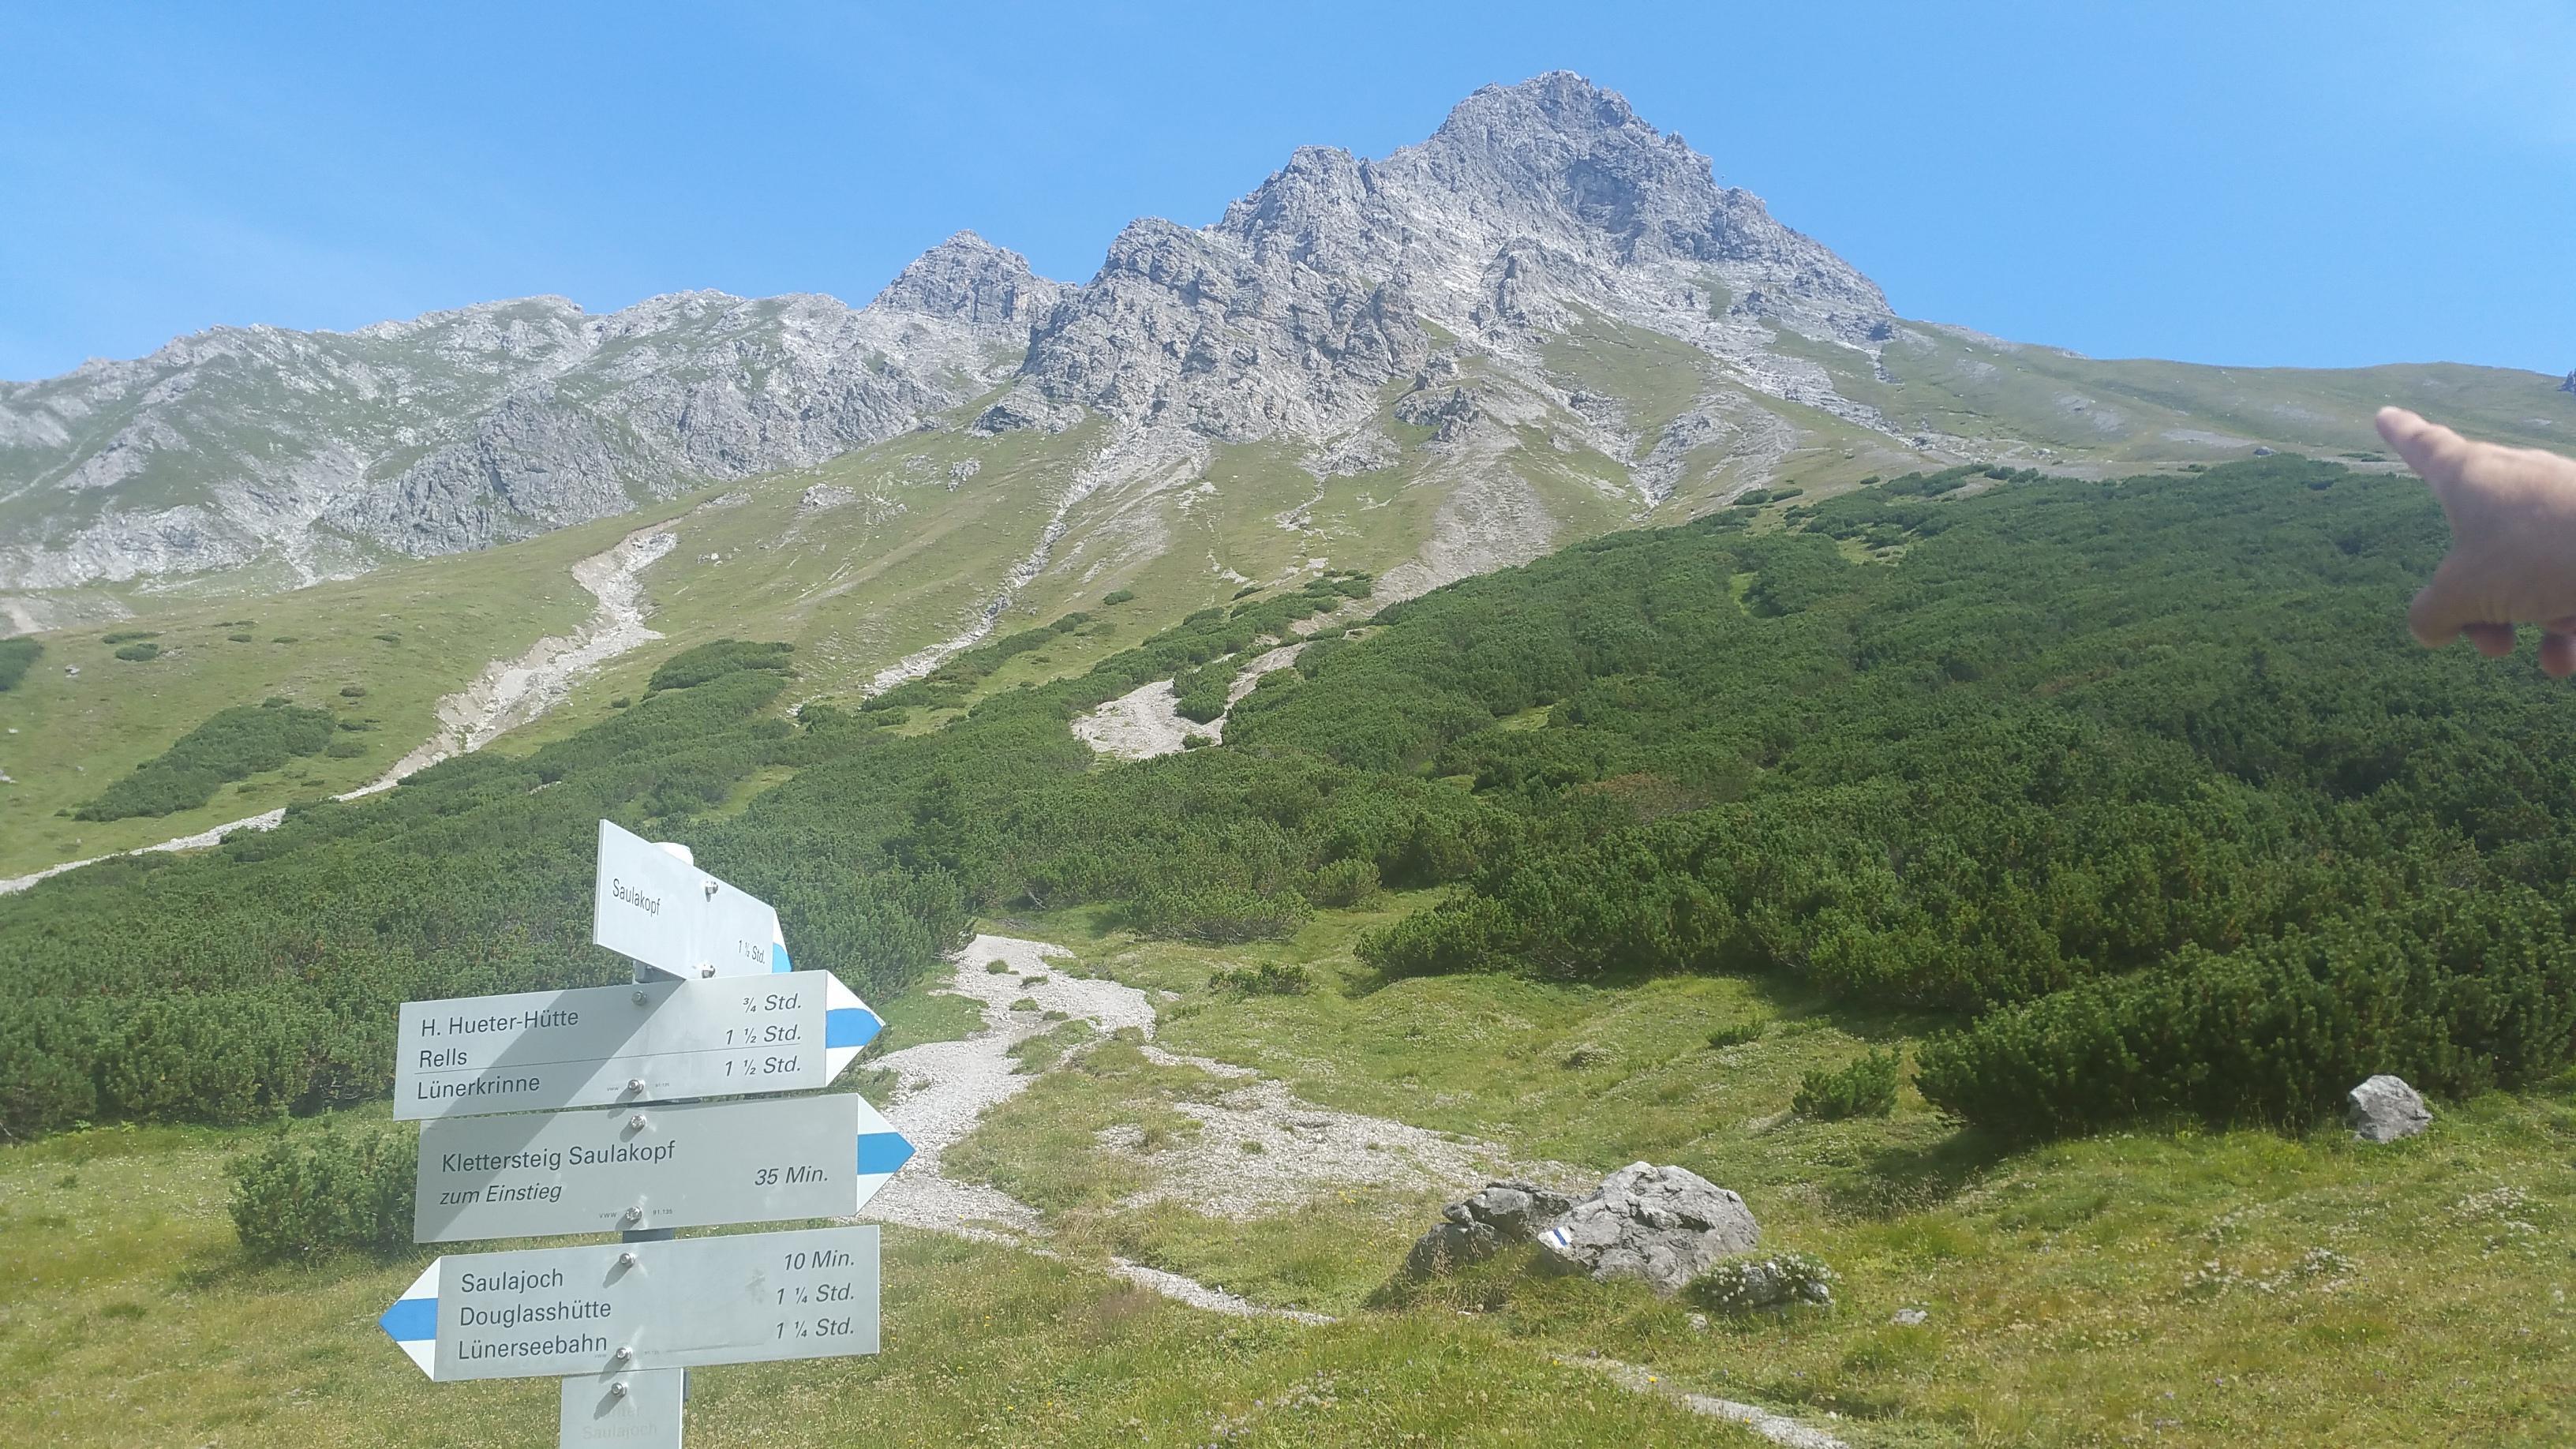 Klettersteig Saulakopf : Saulakopf urlaub in vorarlberg